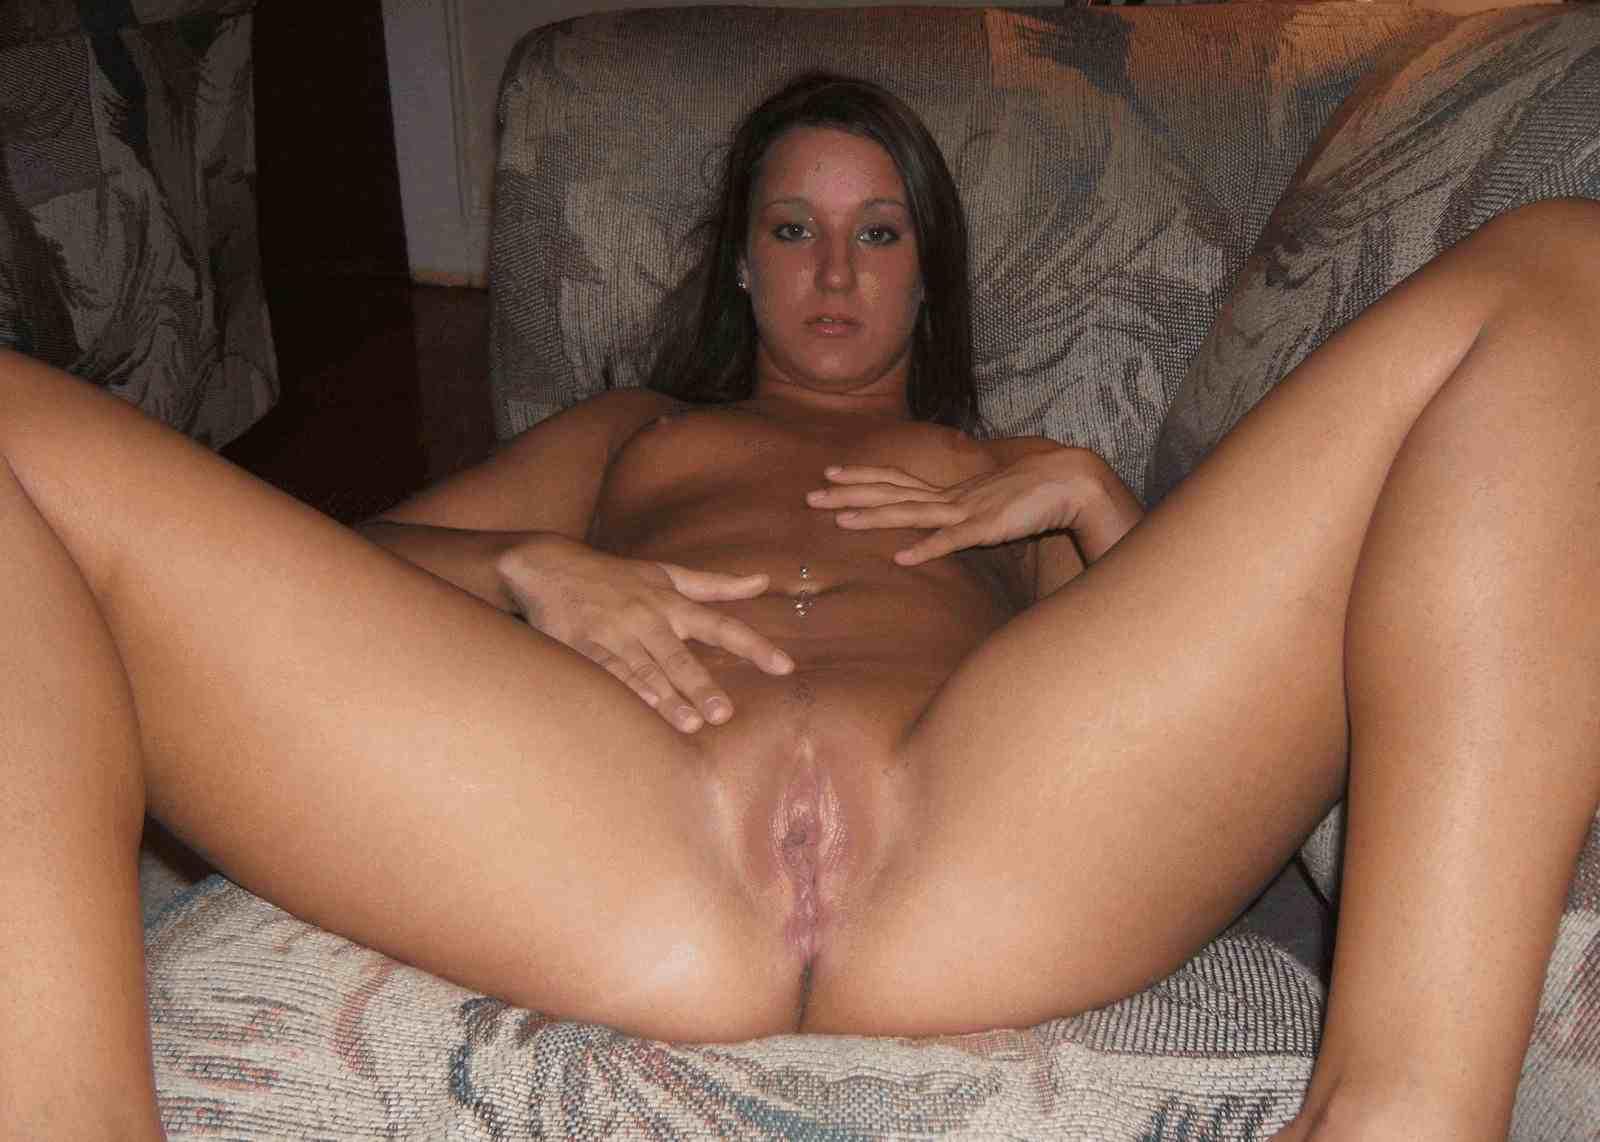 Секс голая девушки фото 23 фотография